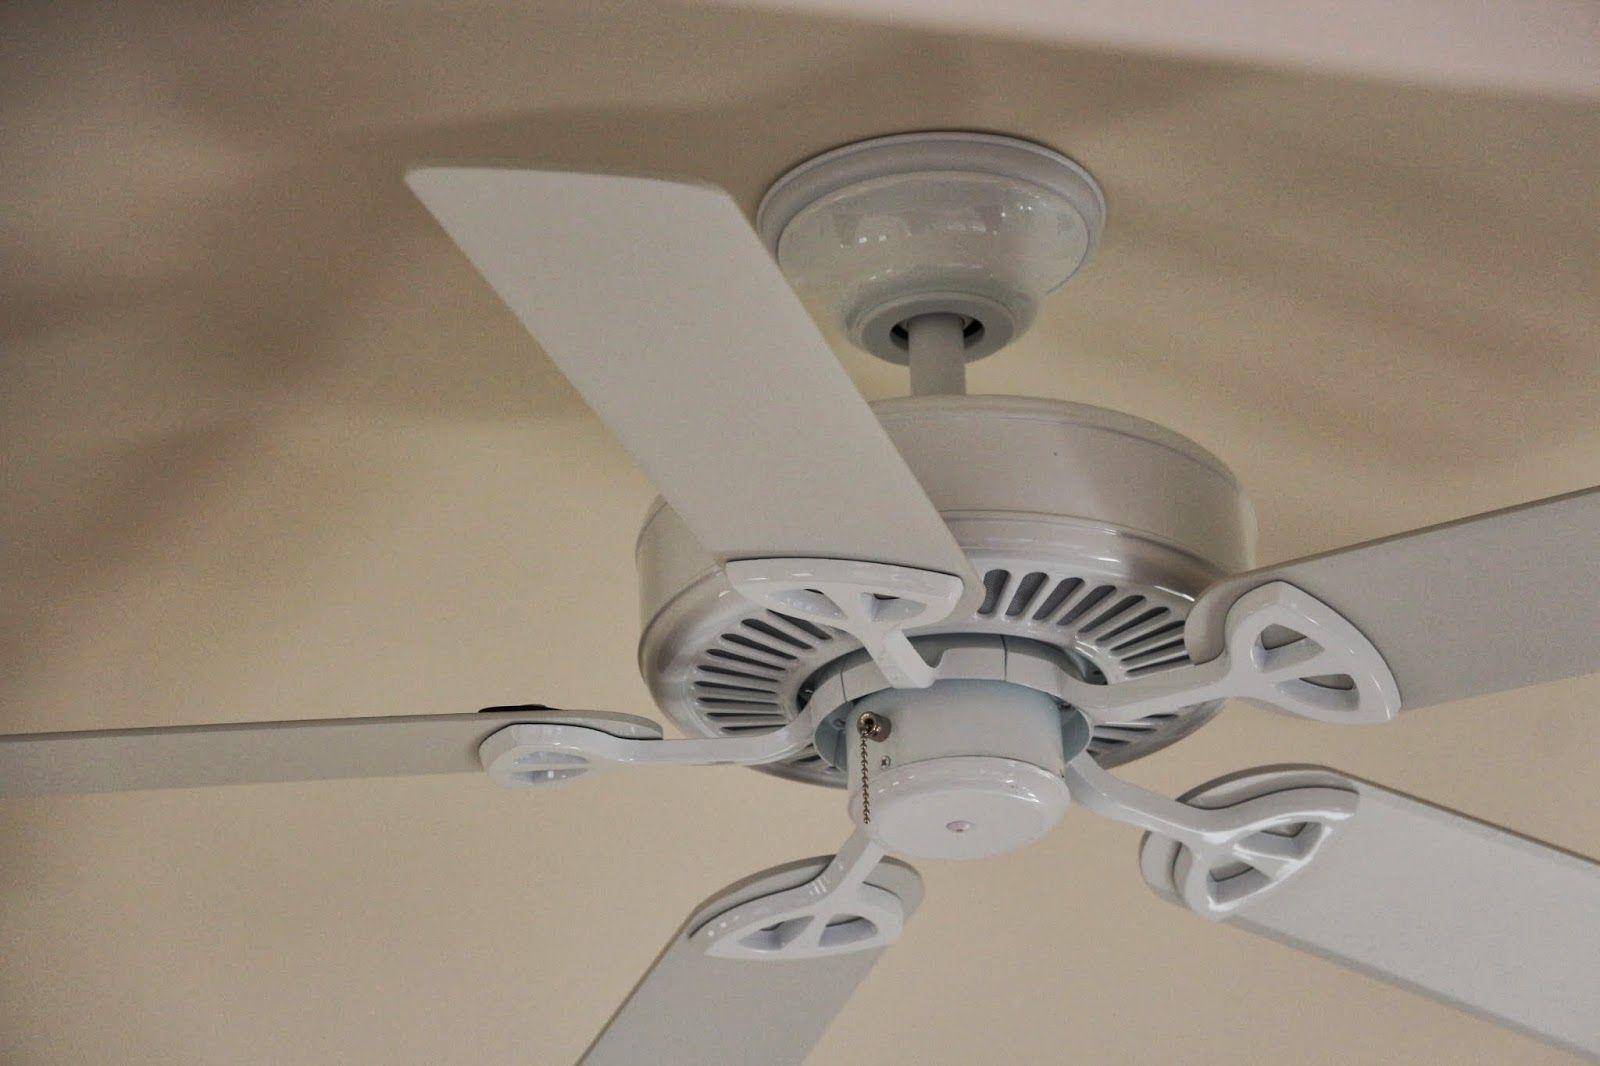 Deckenventilator Badezimmer ~ Cream colored ceiling fans http: ladysro.info pinterest